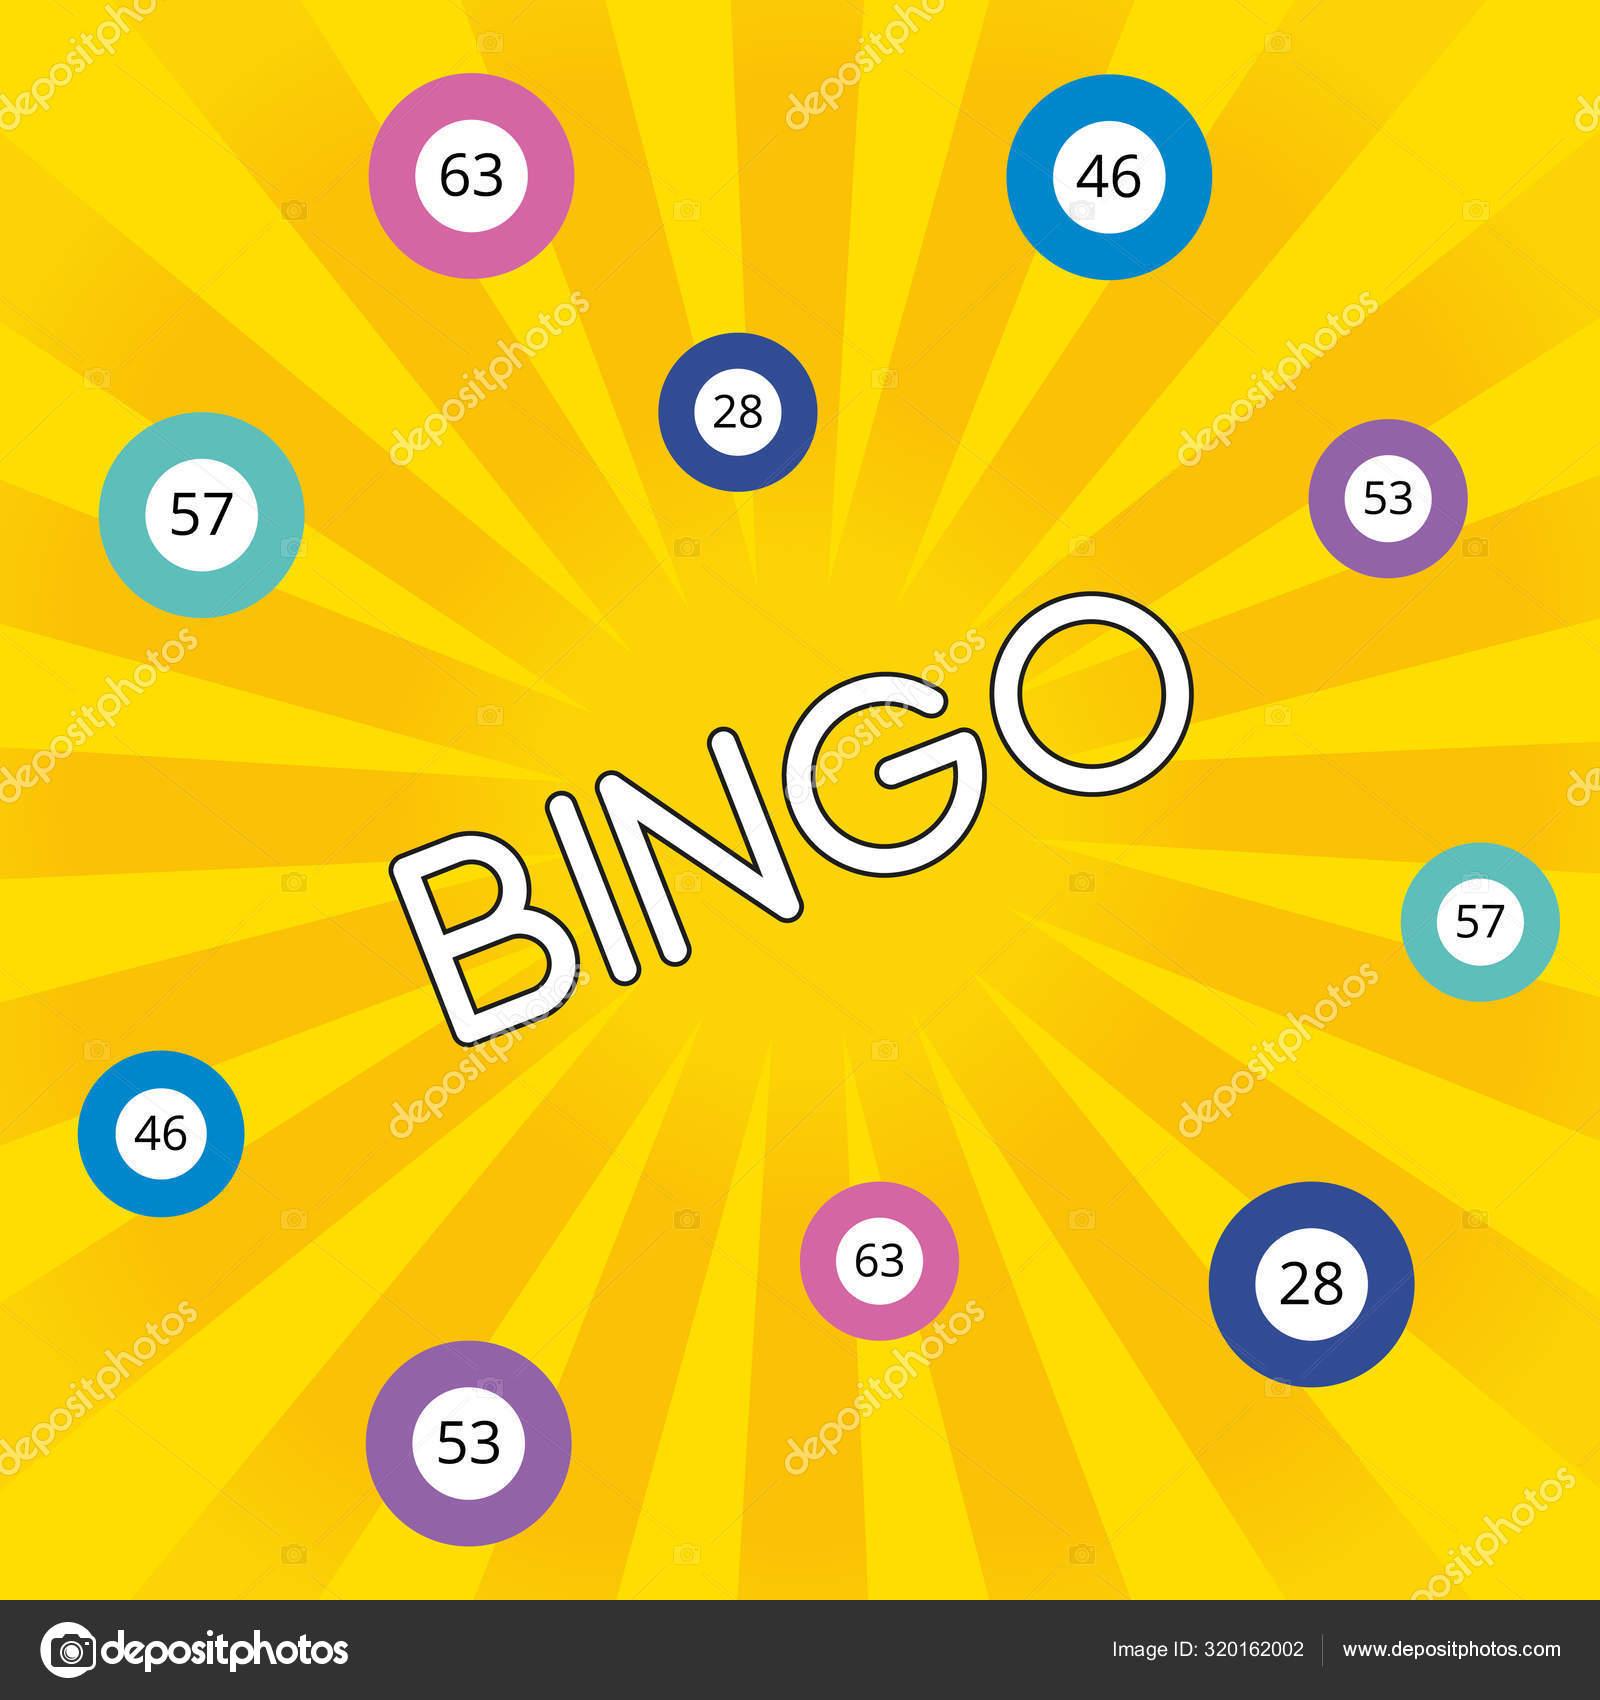 170 Bingo Flyer Vector Images Free Royalty Free Bingo Flyer Vectors Depositphotos